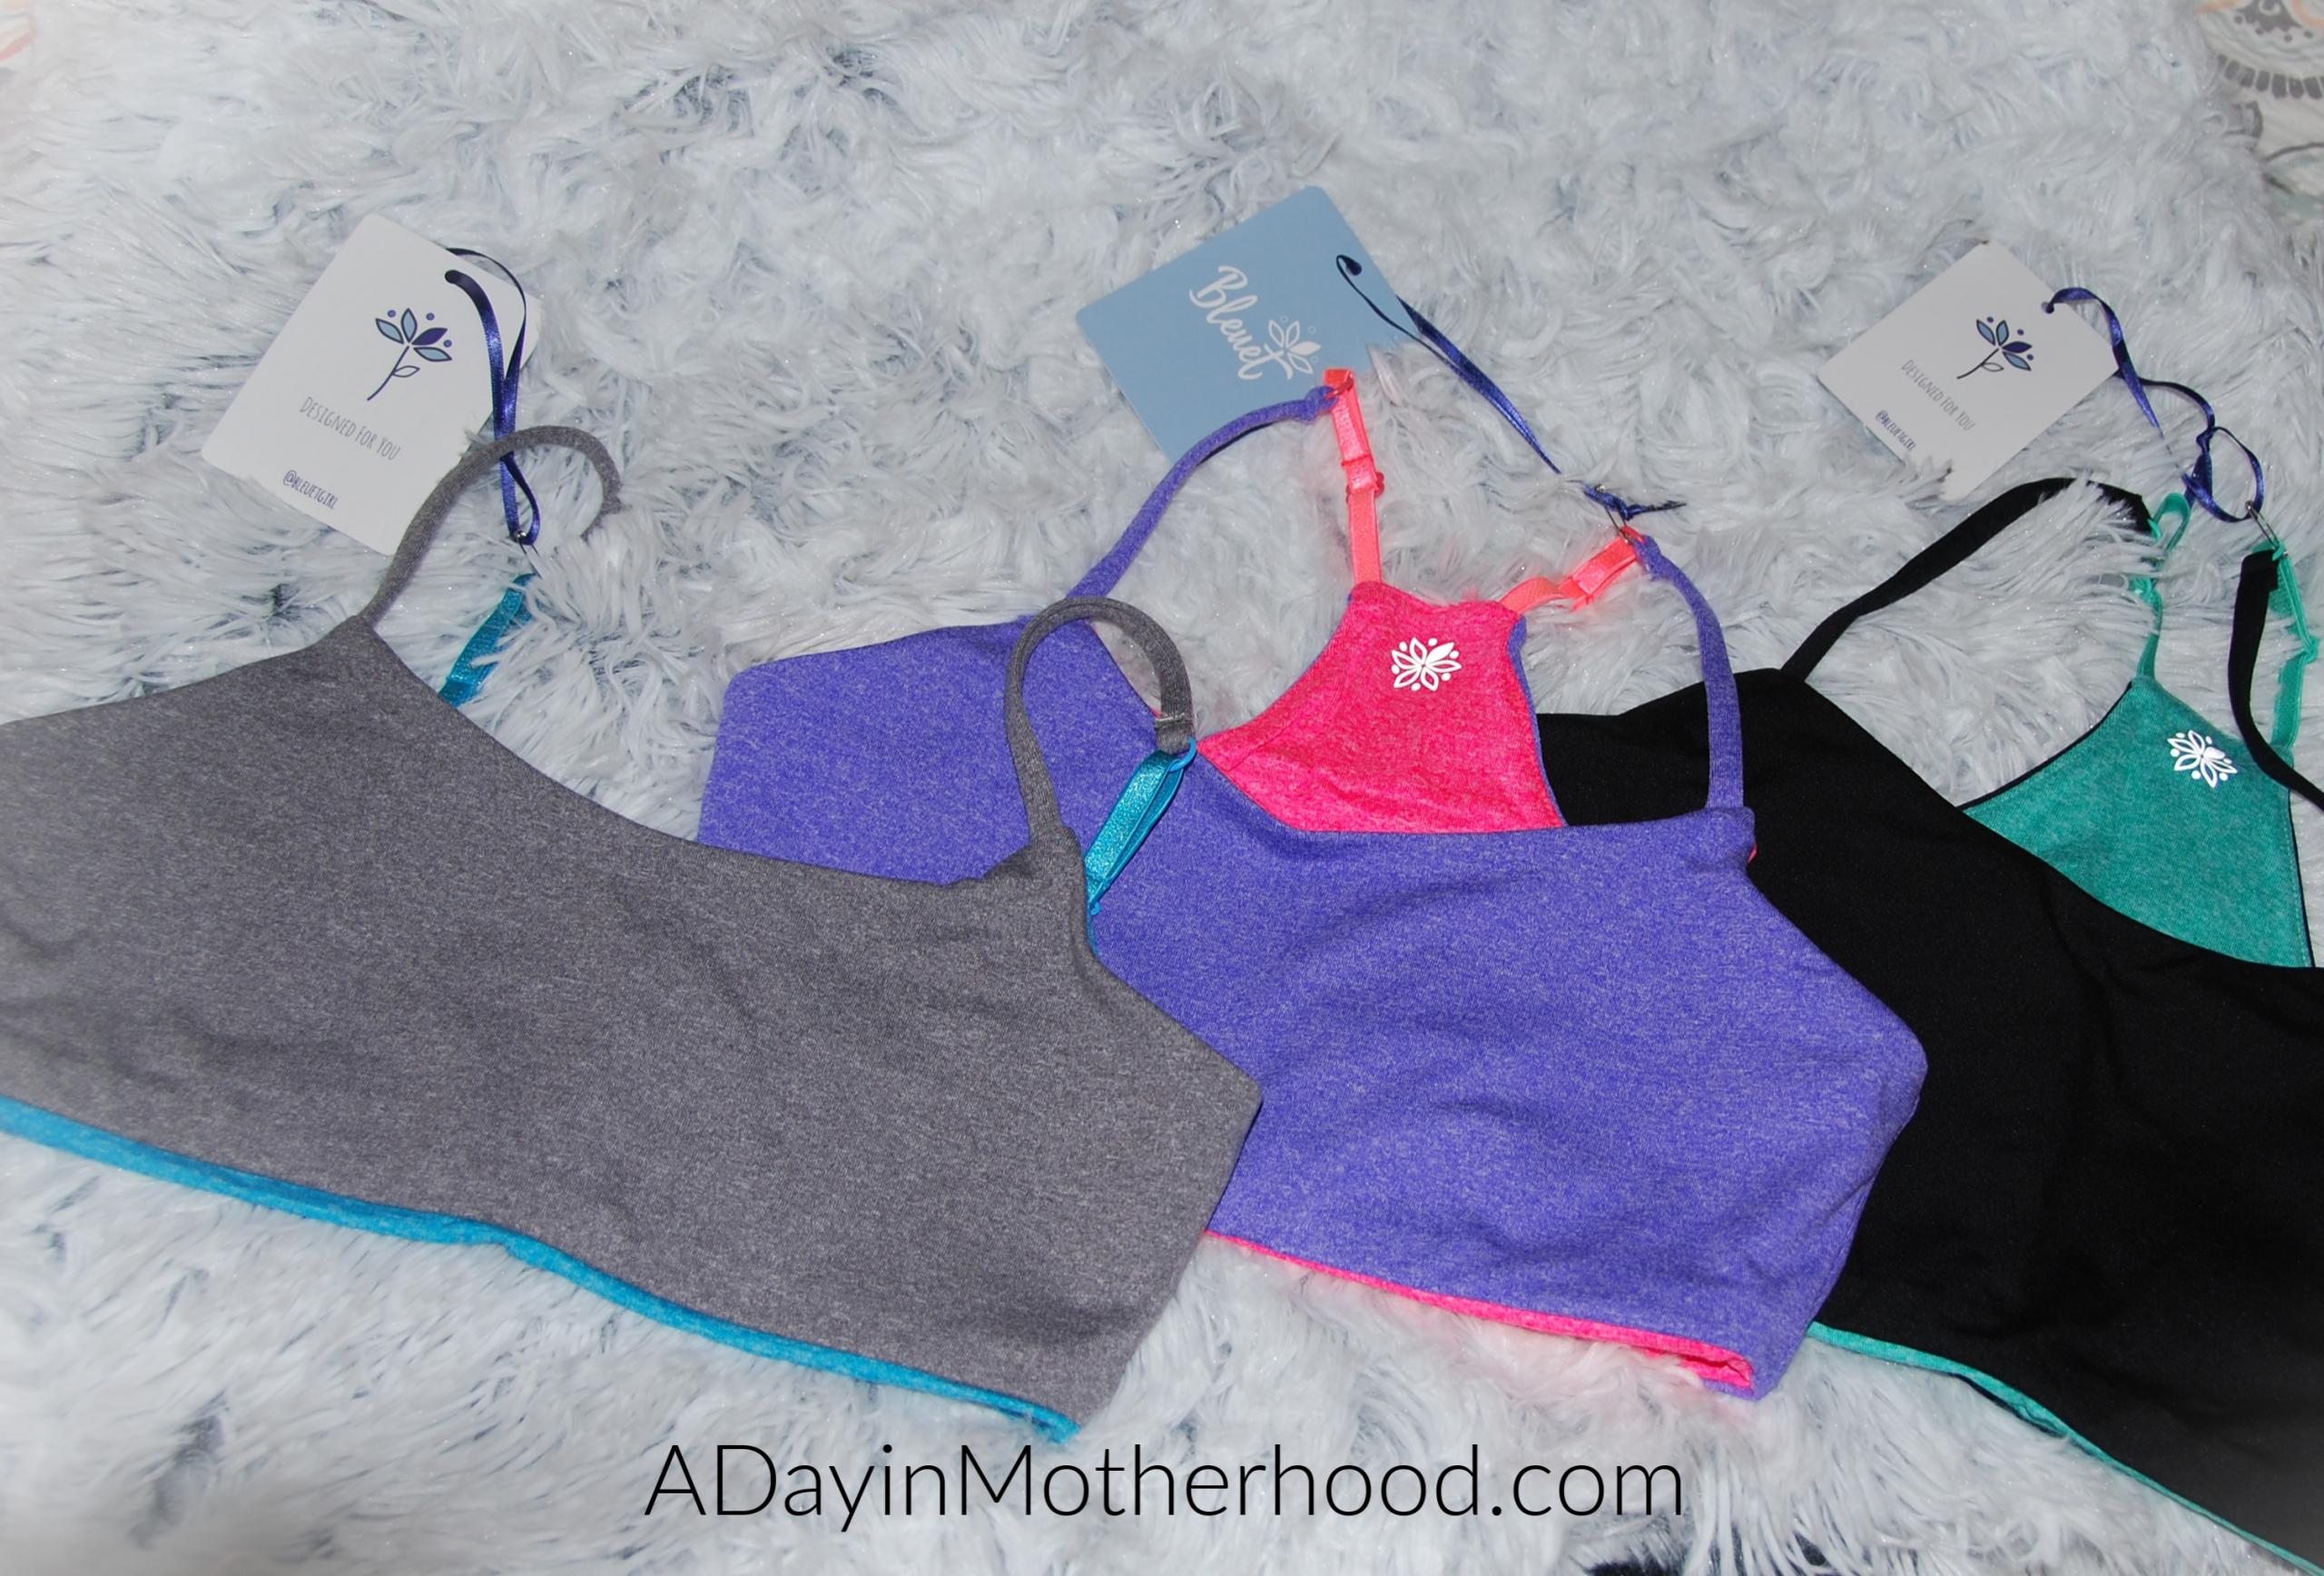 Bleuet-A Better Bra for Tweens and Teens-photo of 3 colorful bras on ADayinMotherhood.com